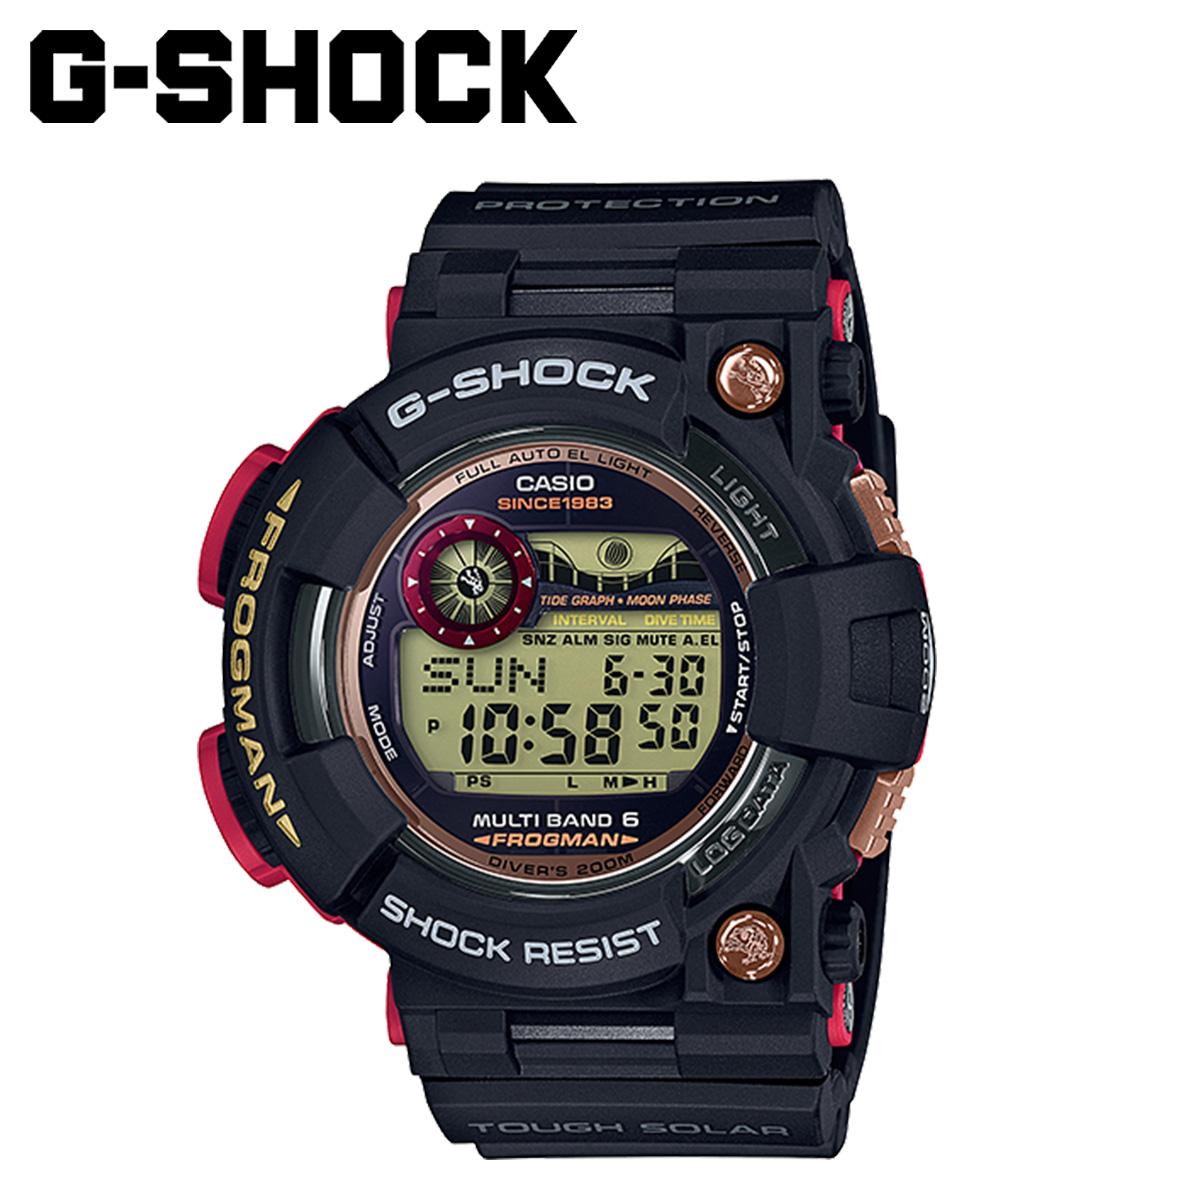 CASIO カシオ G-SHOCK 腕時計 GWF-1035F-1JR FROGMAN MAGMA OCEAN 35周年 ブラック メンズ レディース